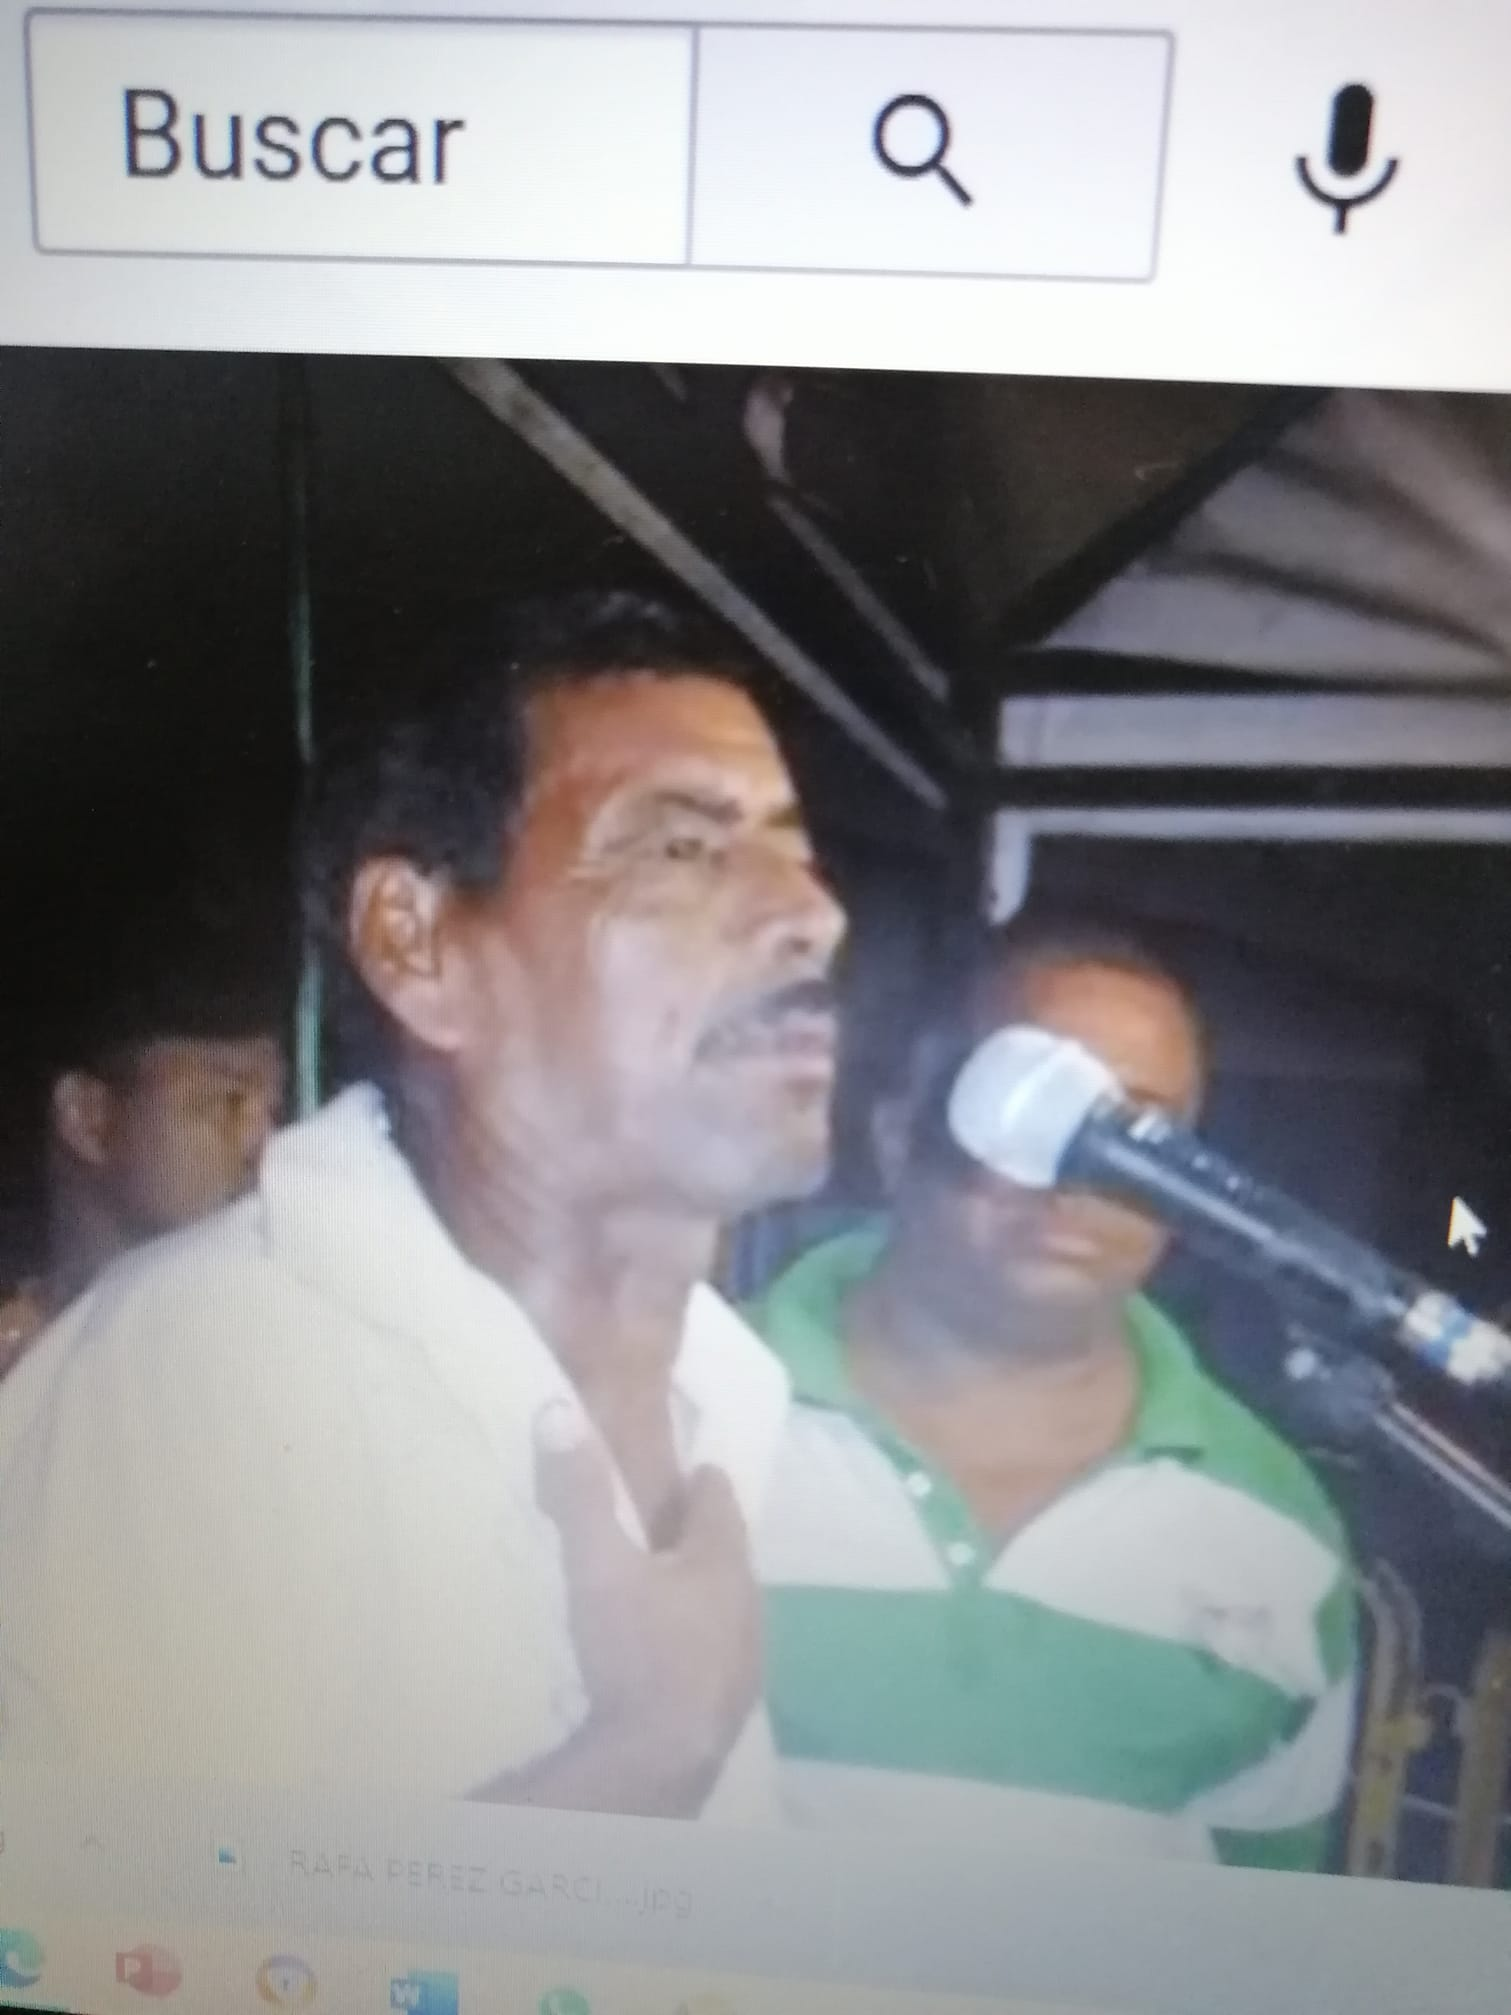 RAFAEL PEREZ GARCIA 4